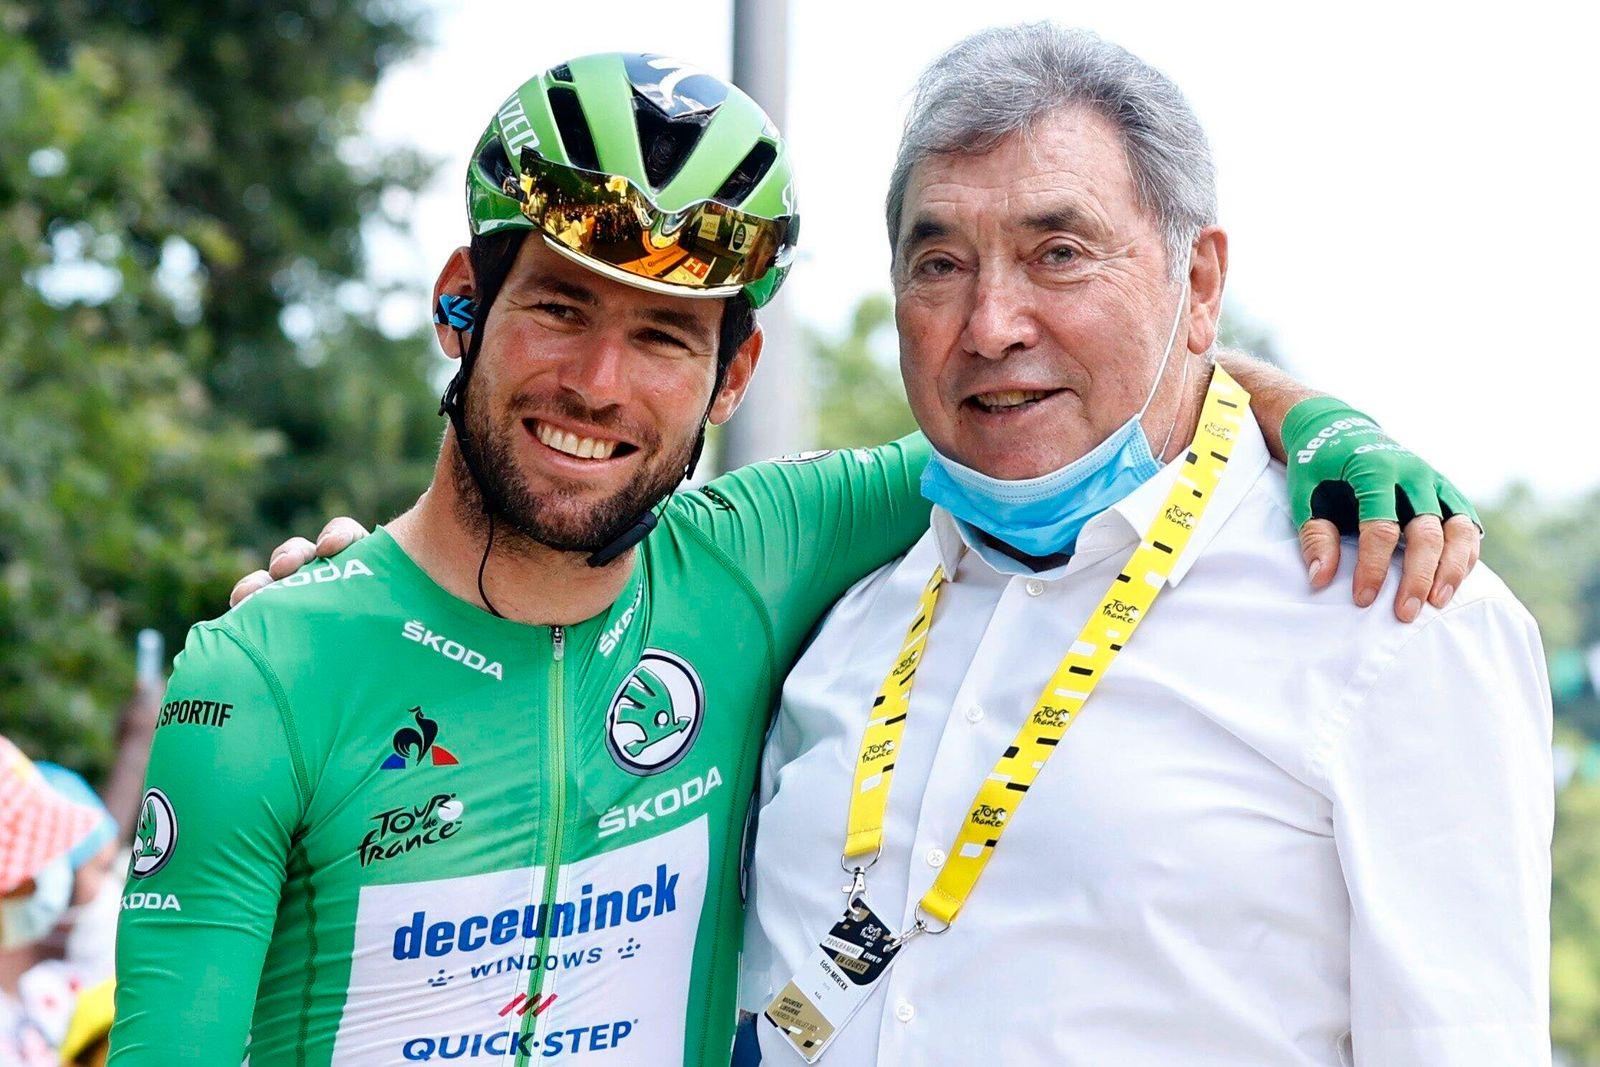 LIBOURNE, FRANCE - JULY 16 : CAVENDISH Mark (GBR) of DECEUNINCK - QUICK-STEP & MERCKX Eddy (BEL) cycling legend of Belg